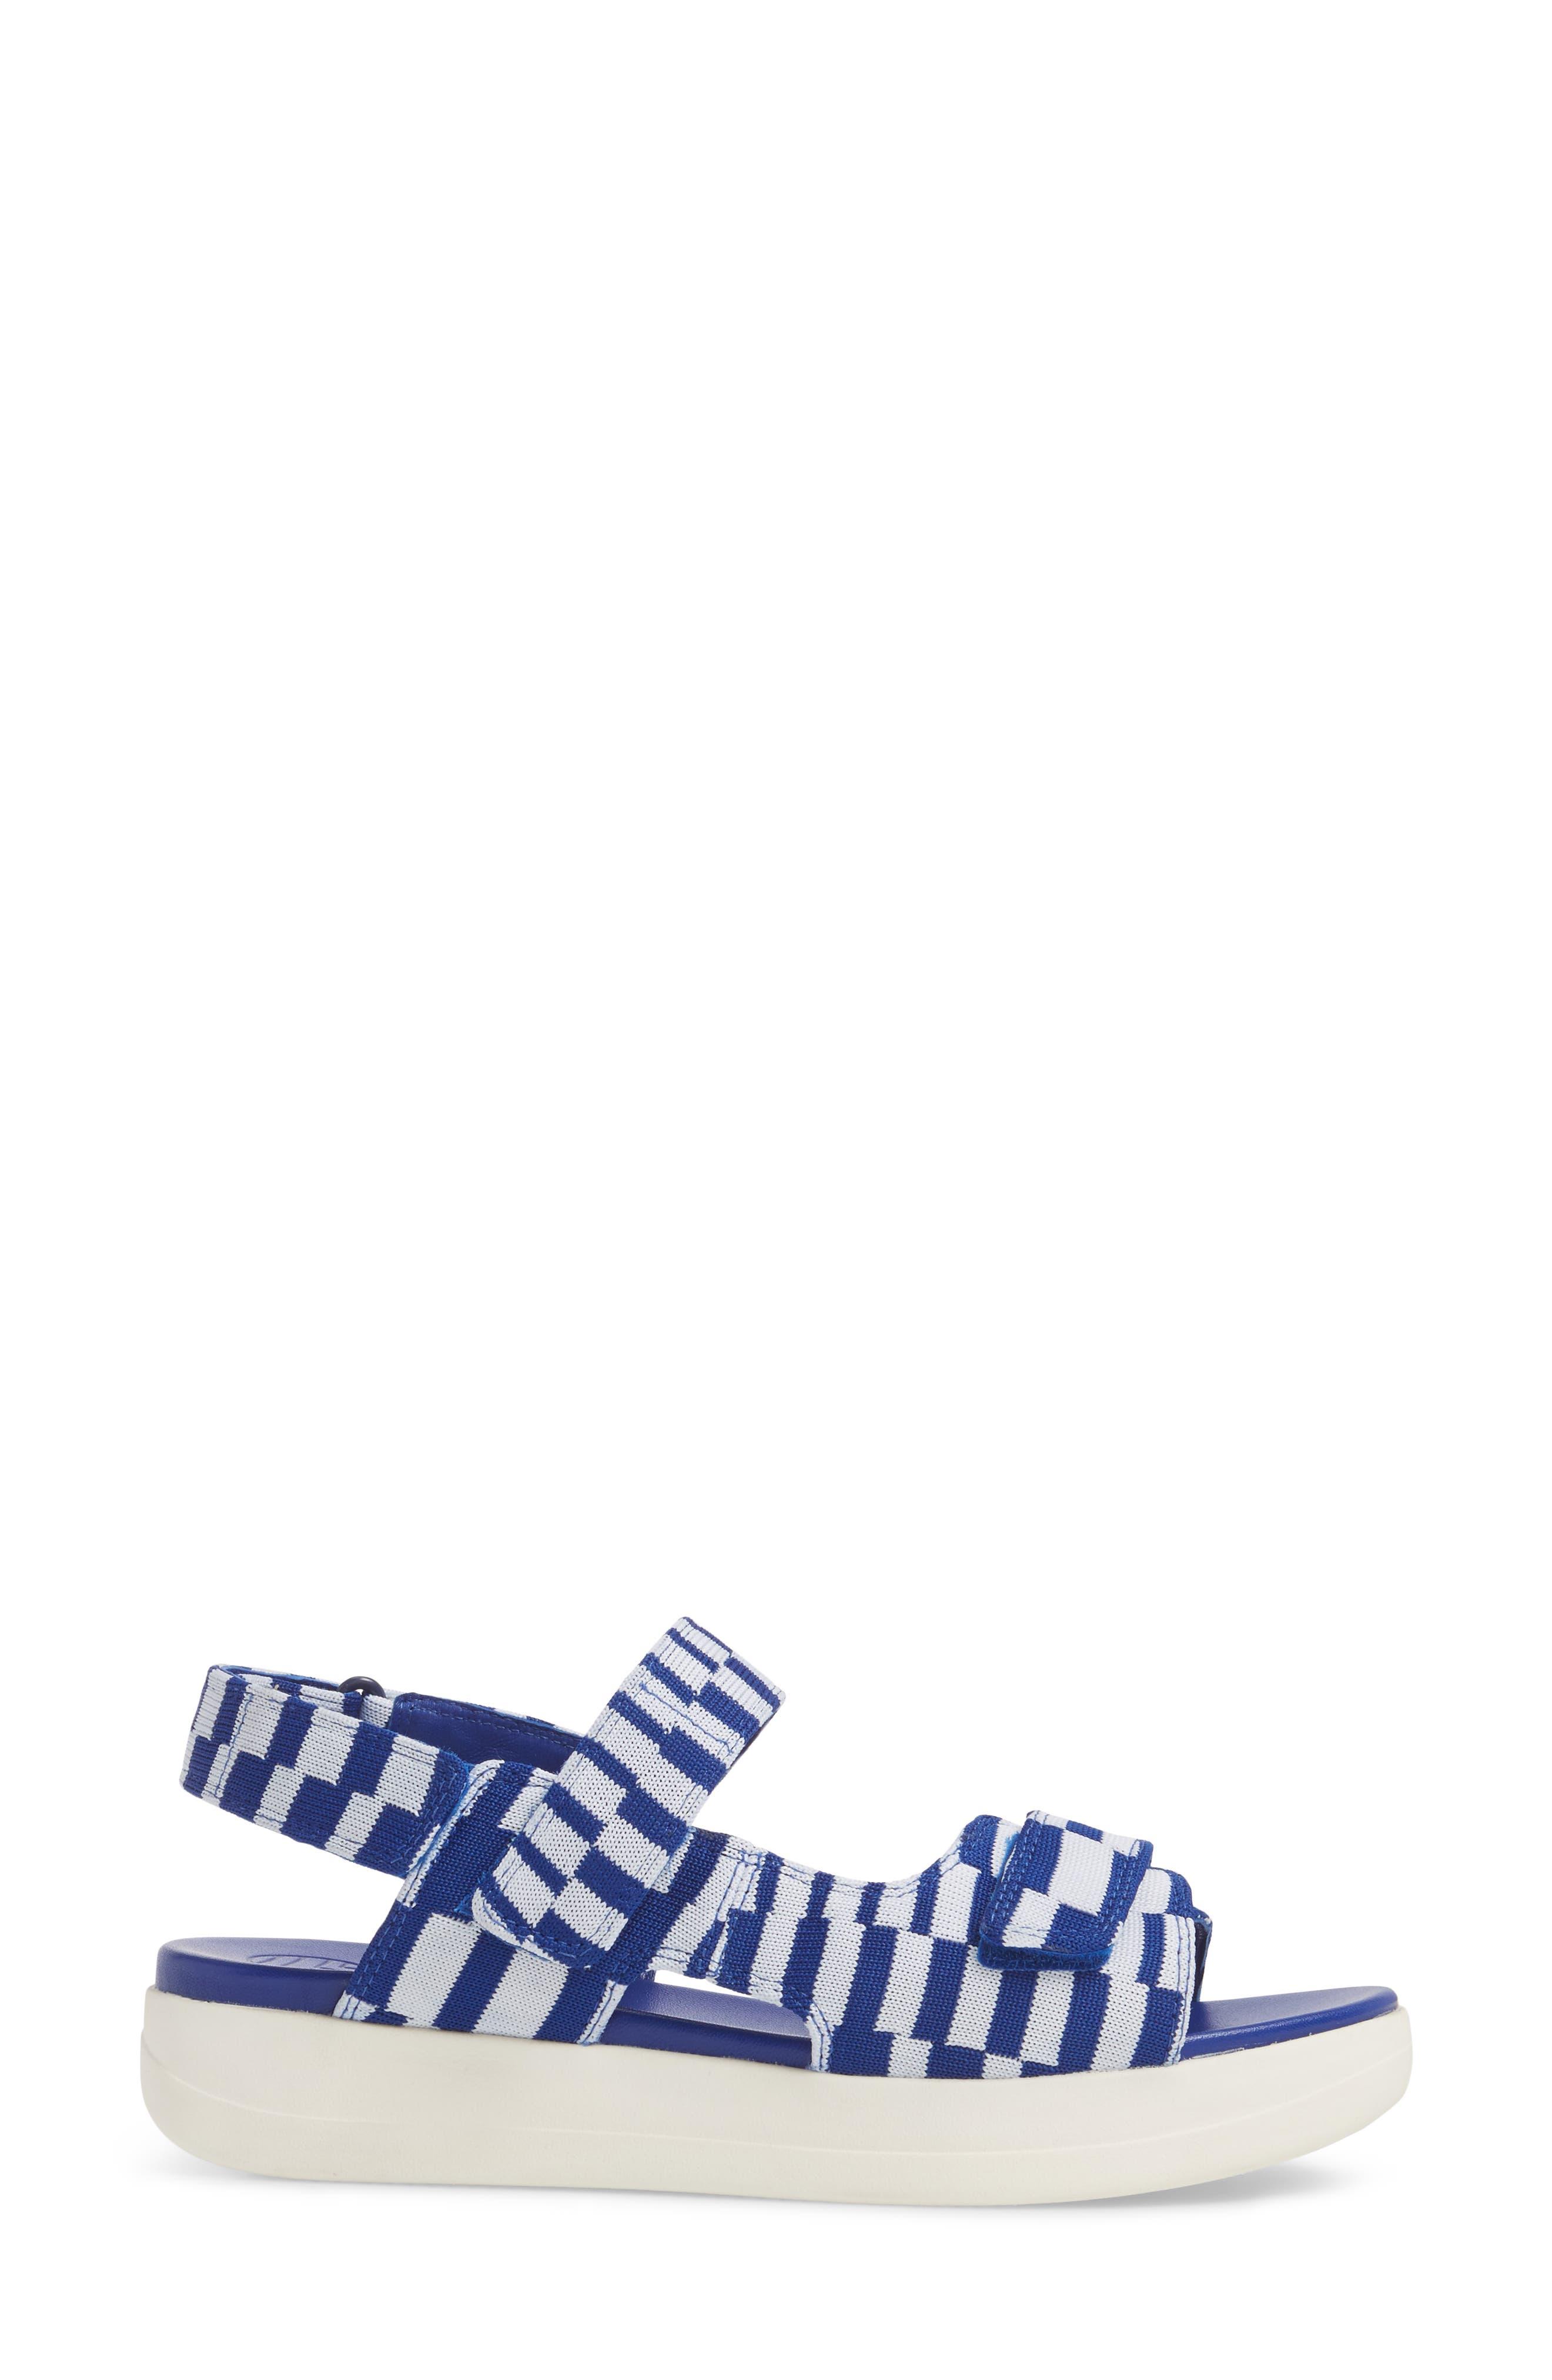 Flatform Sandal,                             Alternate thumbnail 3, color,                             Check Slalom Blue